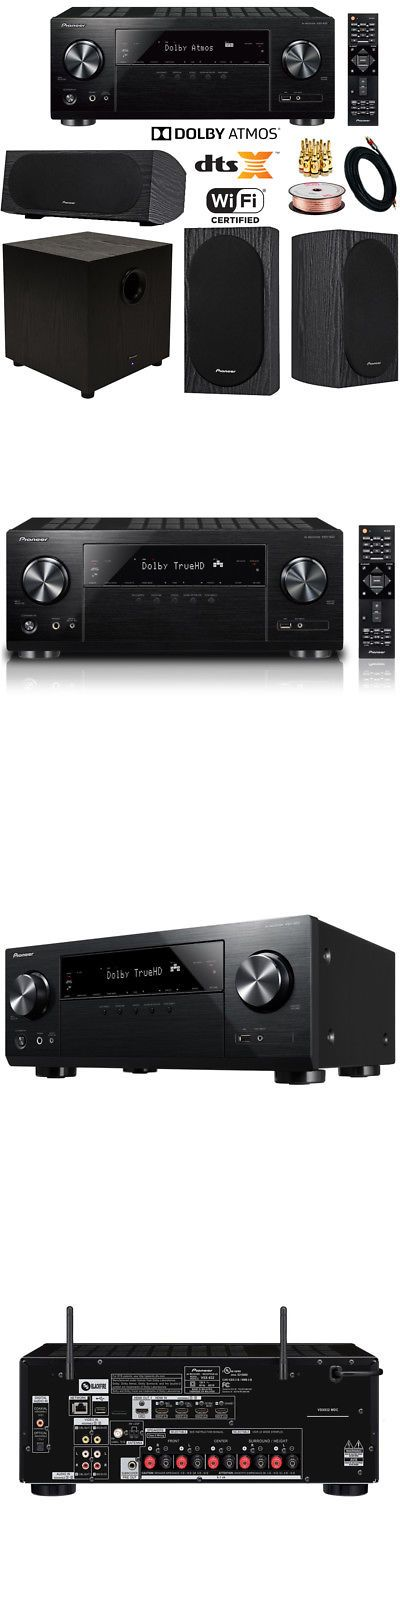 Stereo Receivers: Pioneer Vsx-832 5.1-Ch Network Av Receiver Uhd Pass-Through Hdcp 2.2 Speaker Kit -> BUY IT NOW ONLY: $959.99 on eBay!